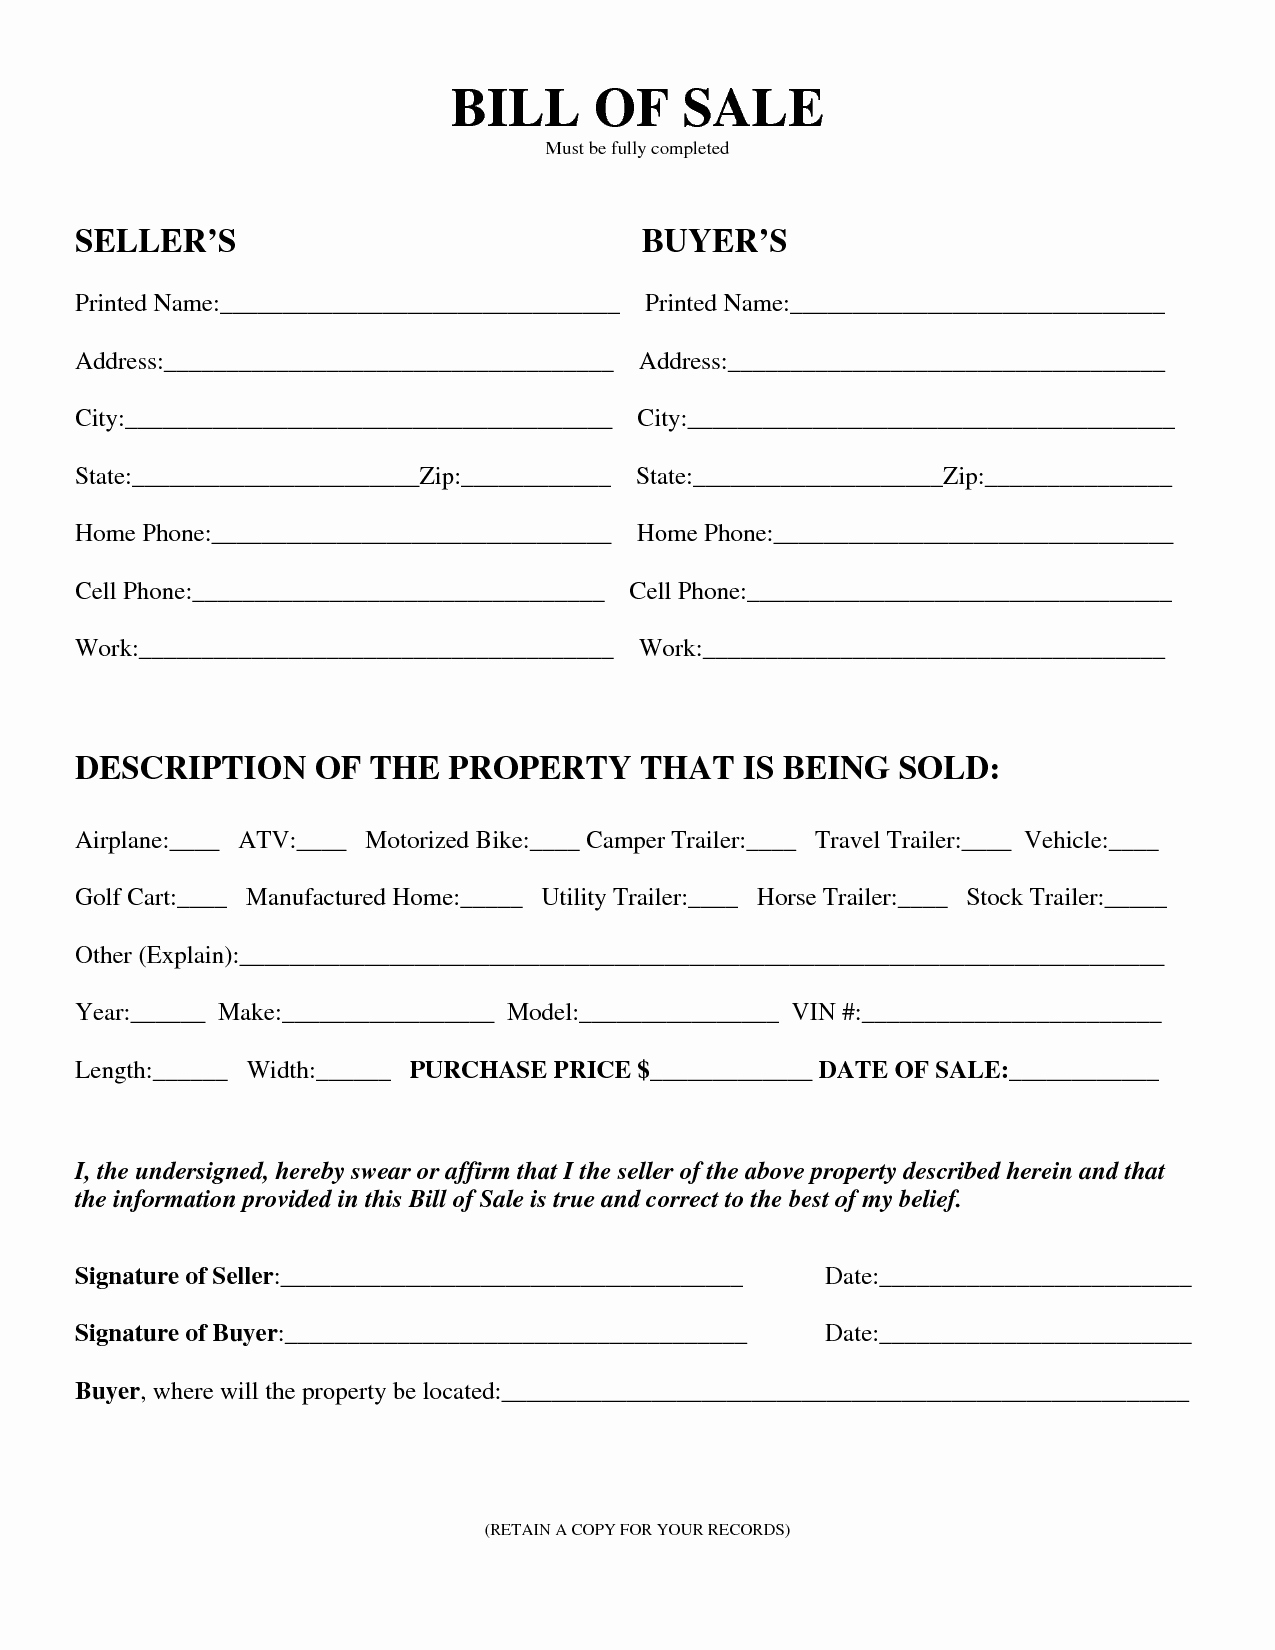 Simple Bill Of Sale Example Elegant Free Printable Equipment Bill Sale Template form Generic